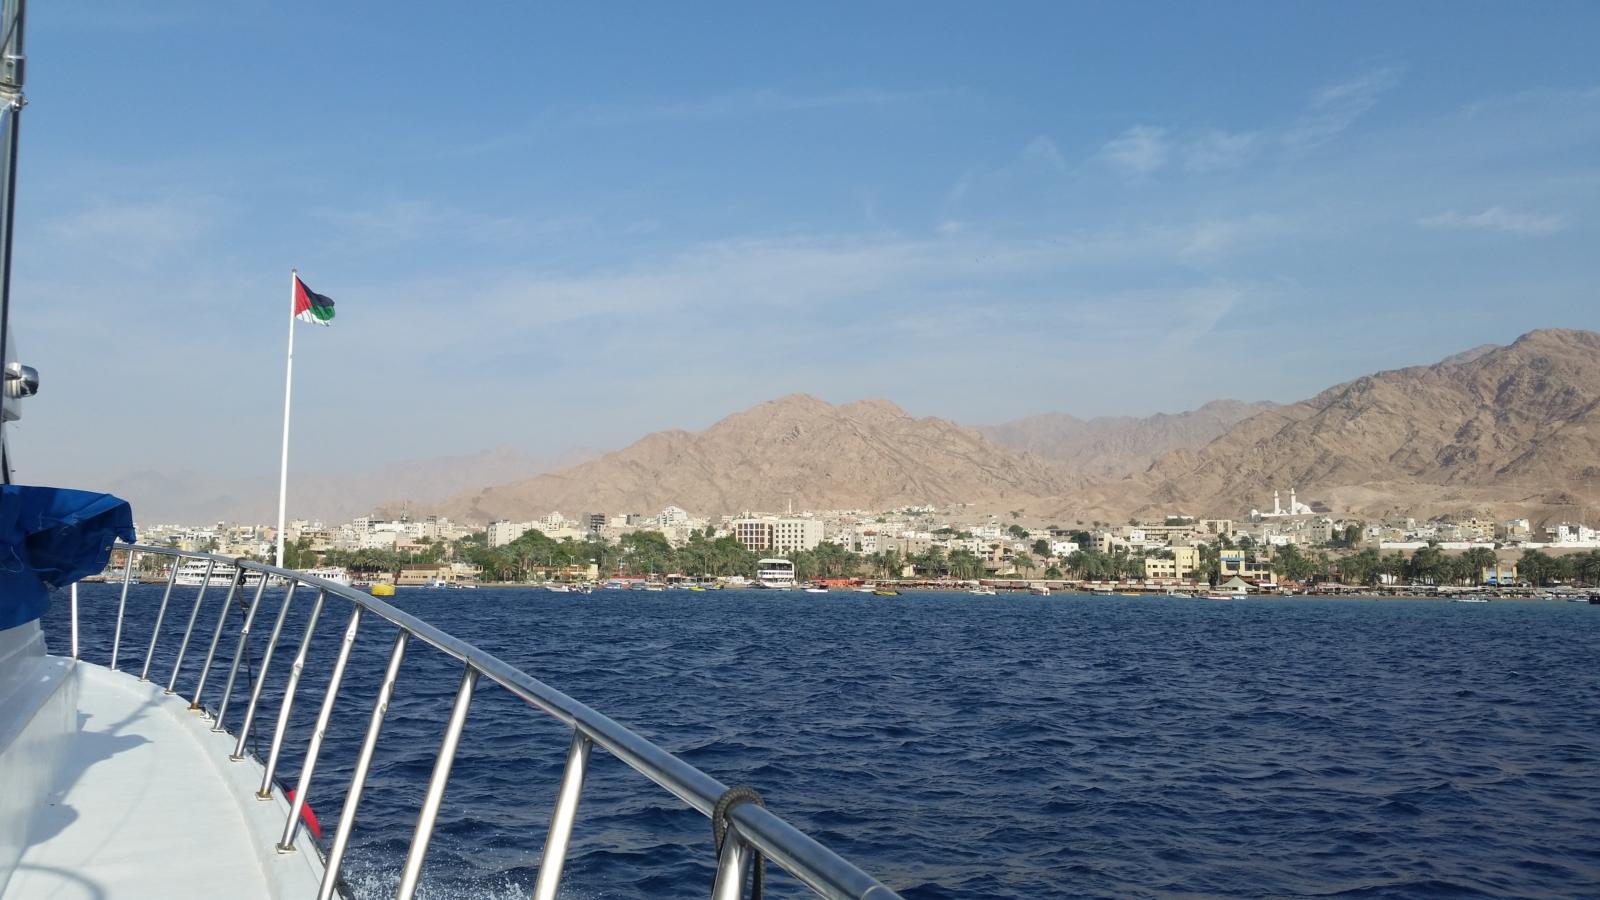 TUI_Jordanien_Aqaba_Rotes Meer_Rote Meer_Schiff_Schifffahrt